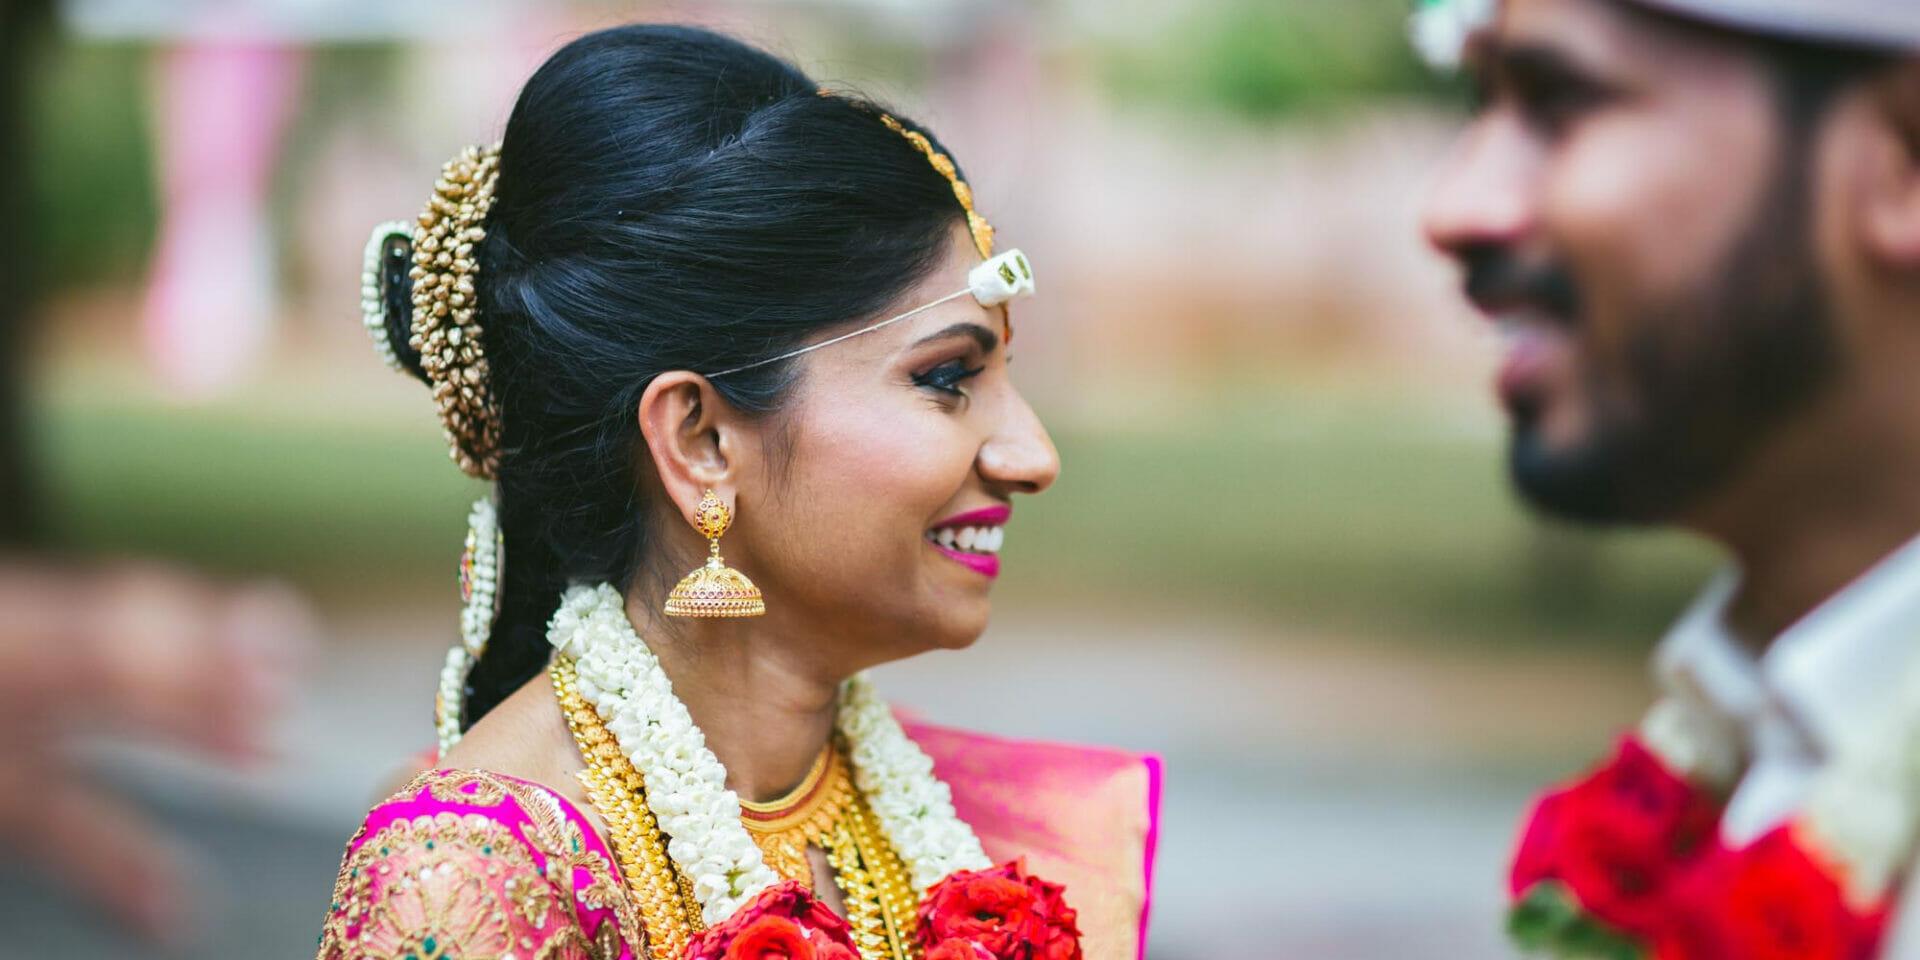 shruti annayya sree vikash photography wedding kalathur gardens 46